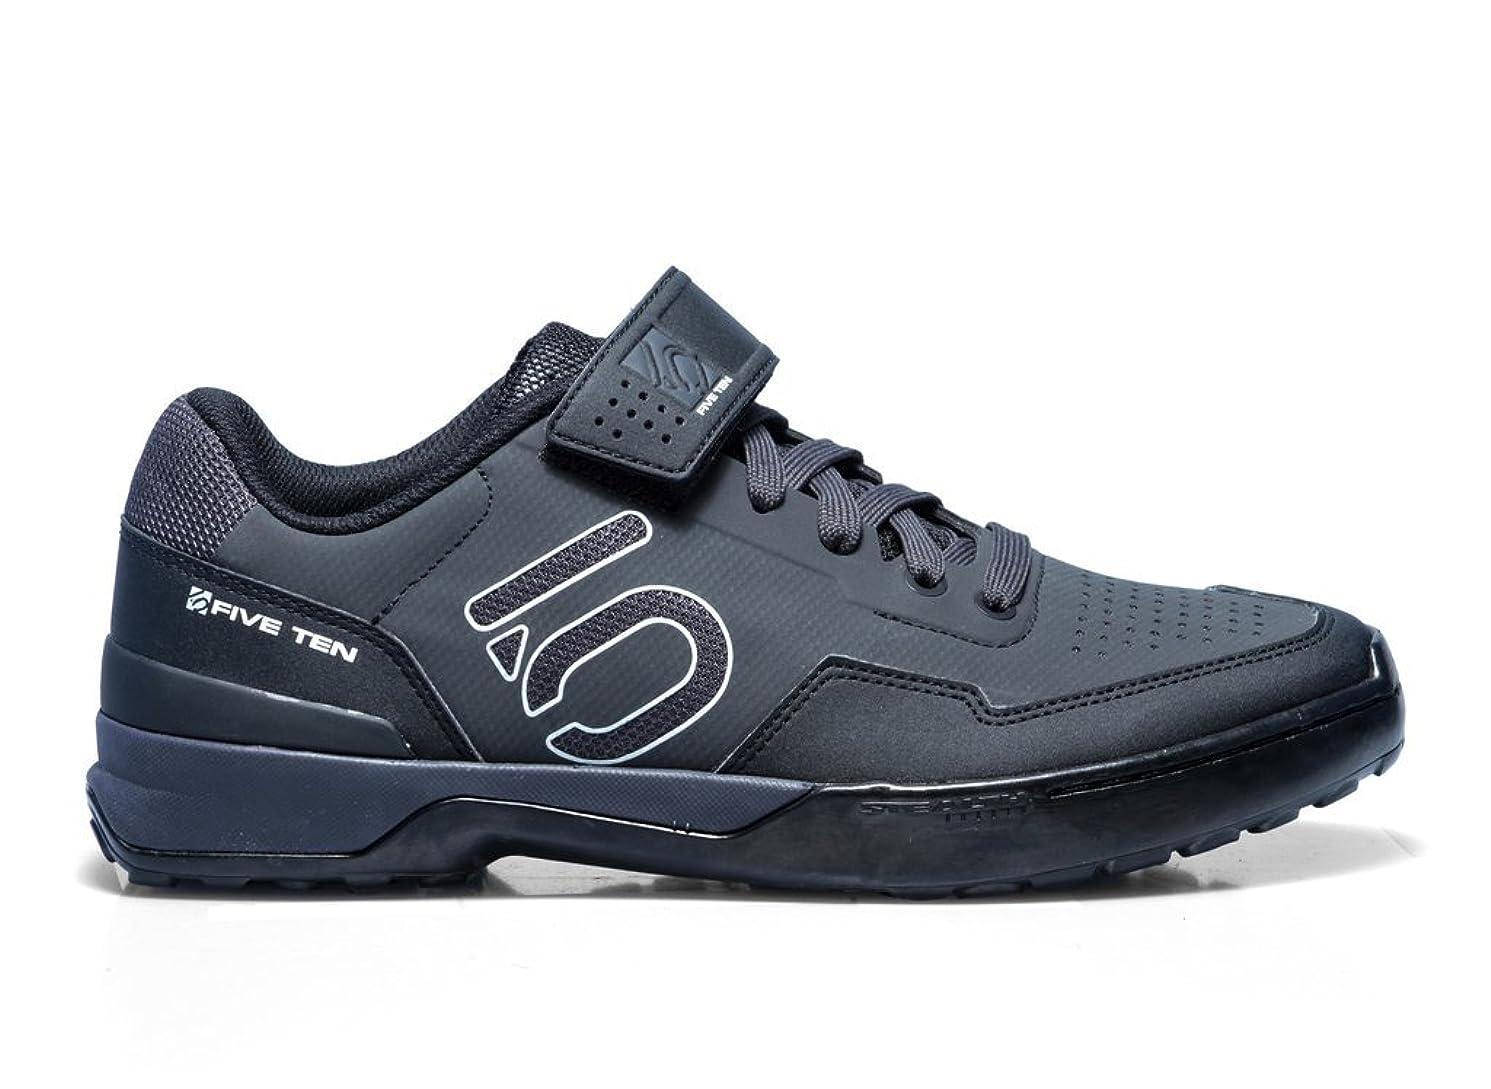 Five Ten Men's Kestrel Lace Mountain Bike Shoes (Clipless)